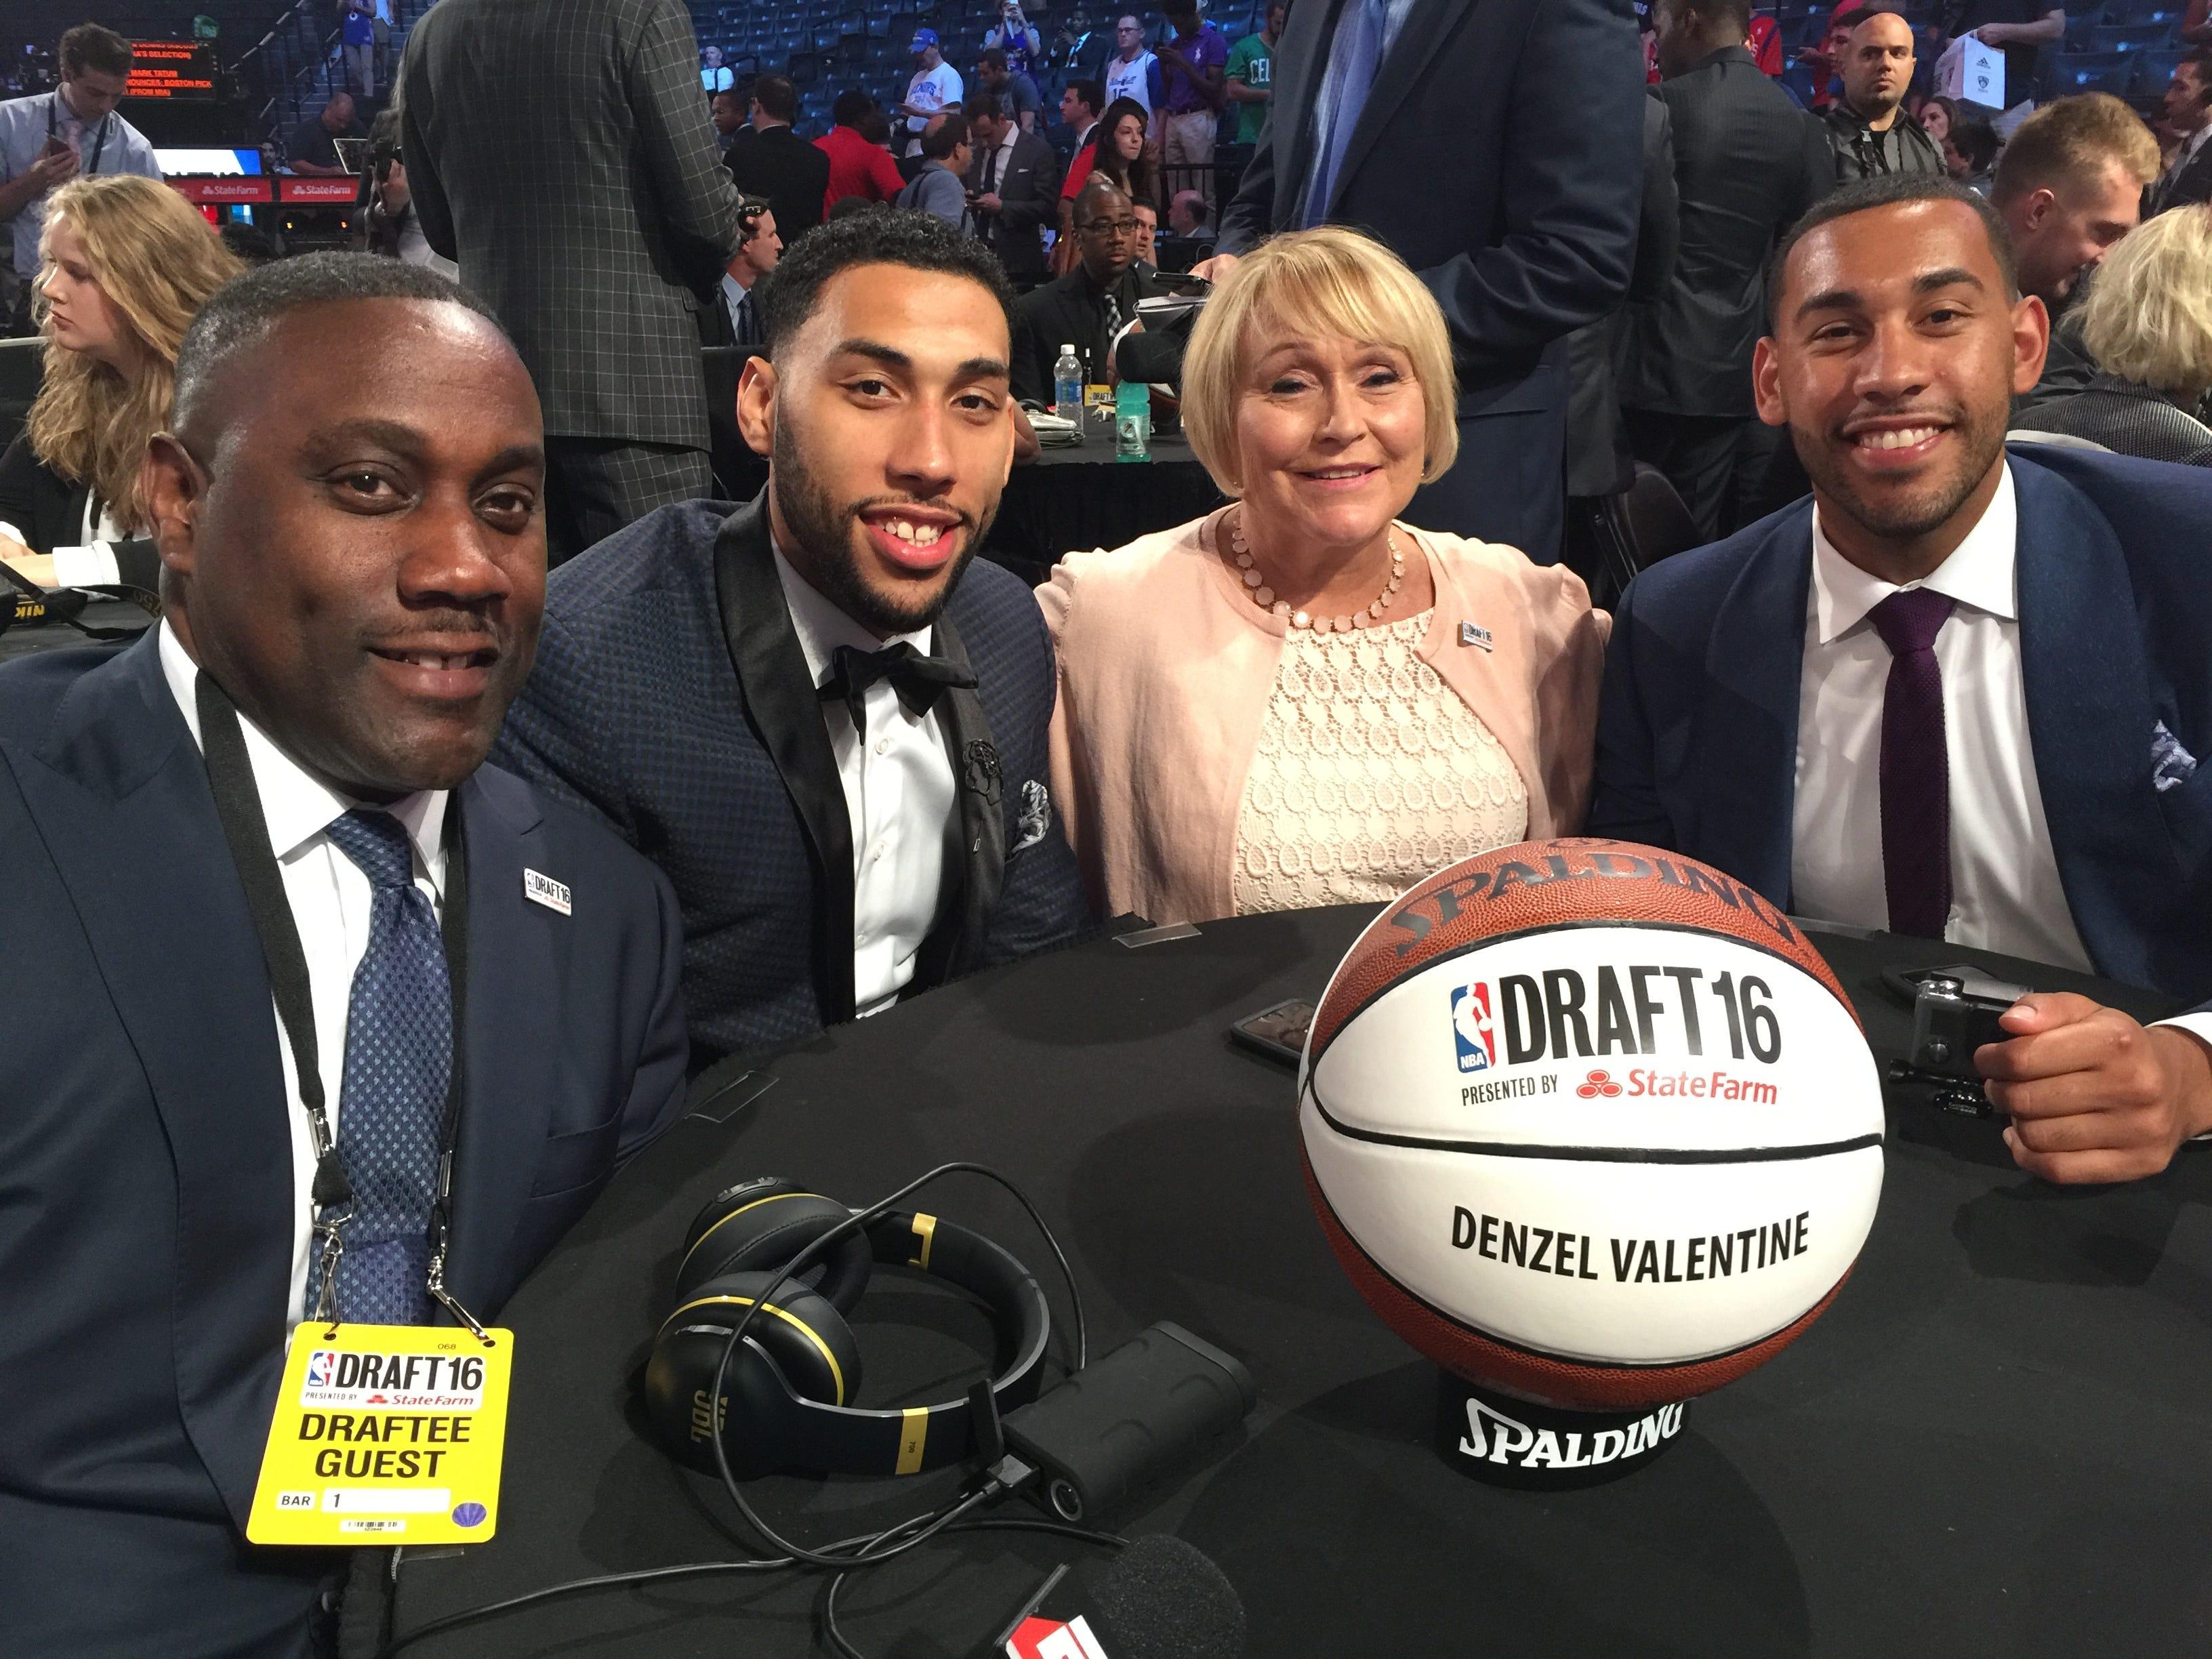 The Valentine Family, (from Left) Carlton, Denzel,